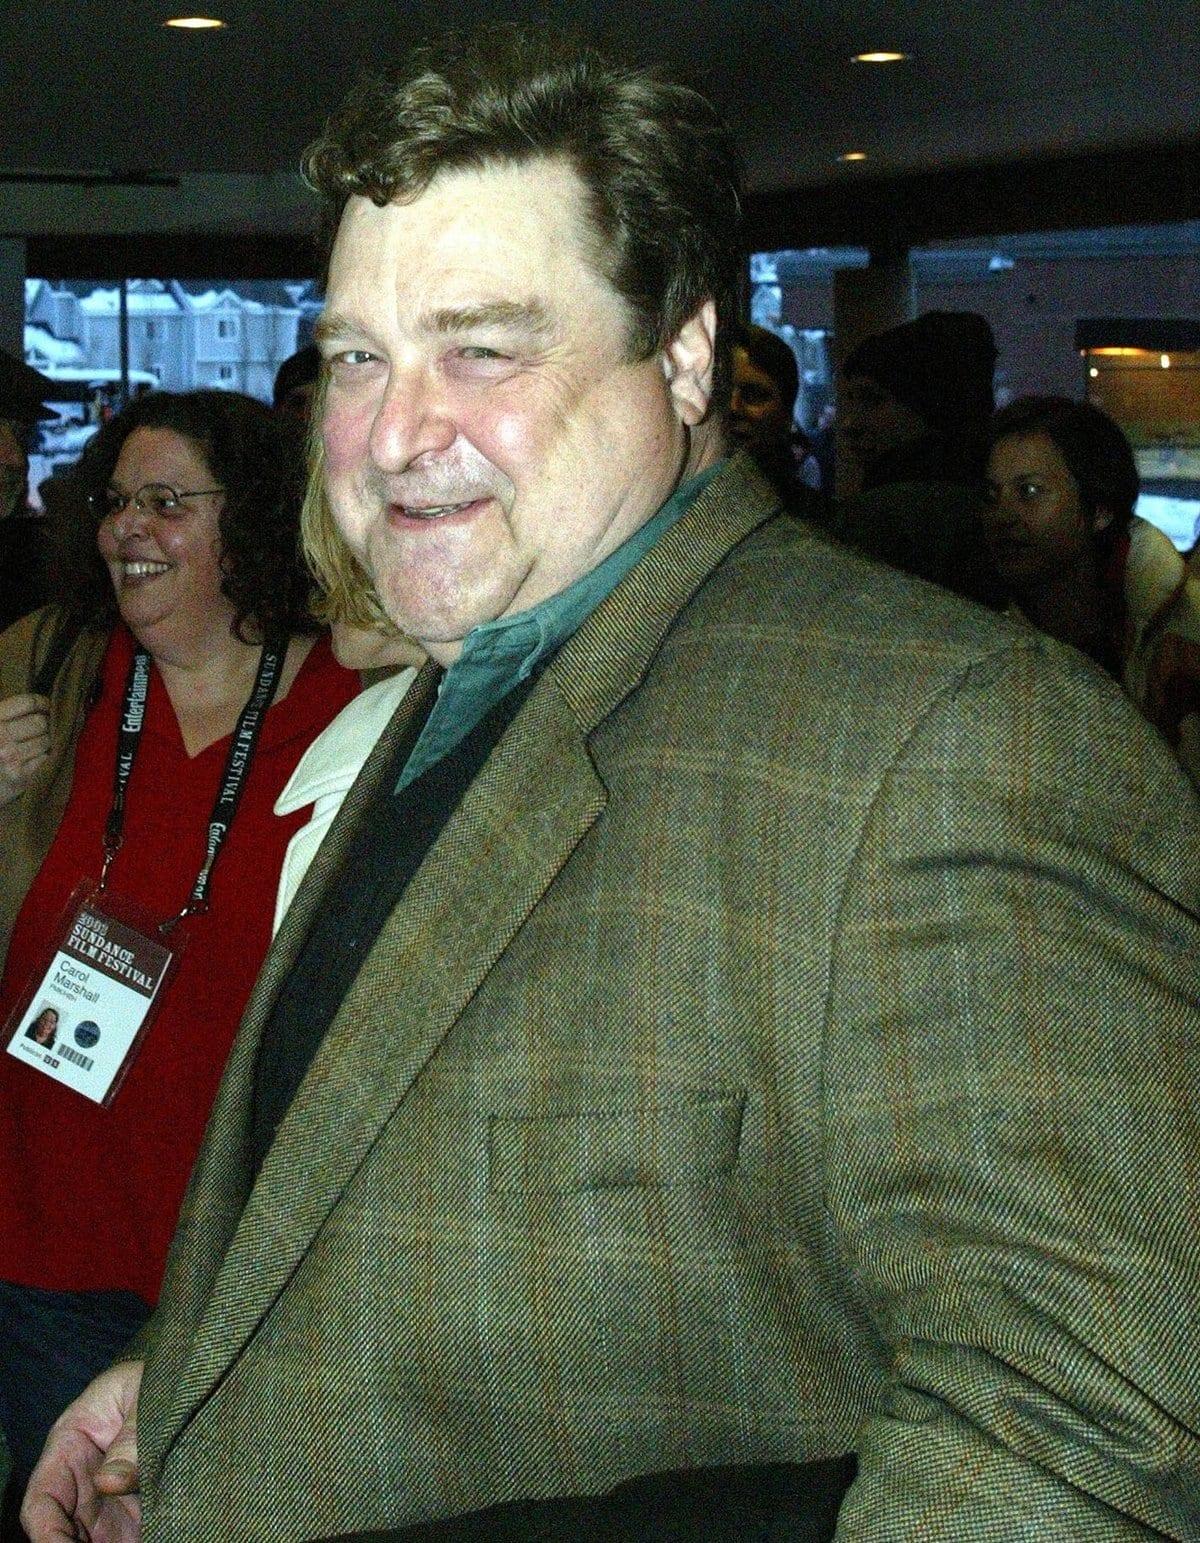 John Goodman before his weight loss at the 2003 Sundance Film Festival